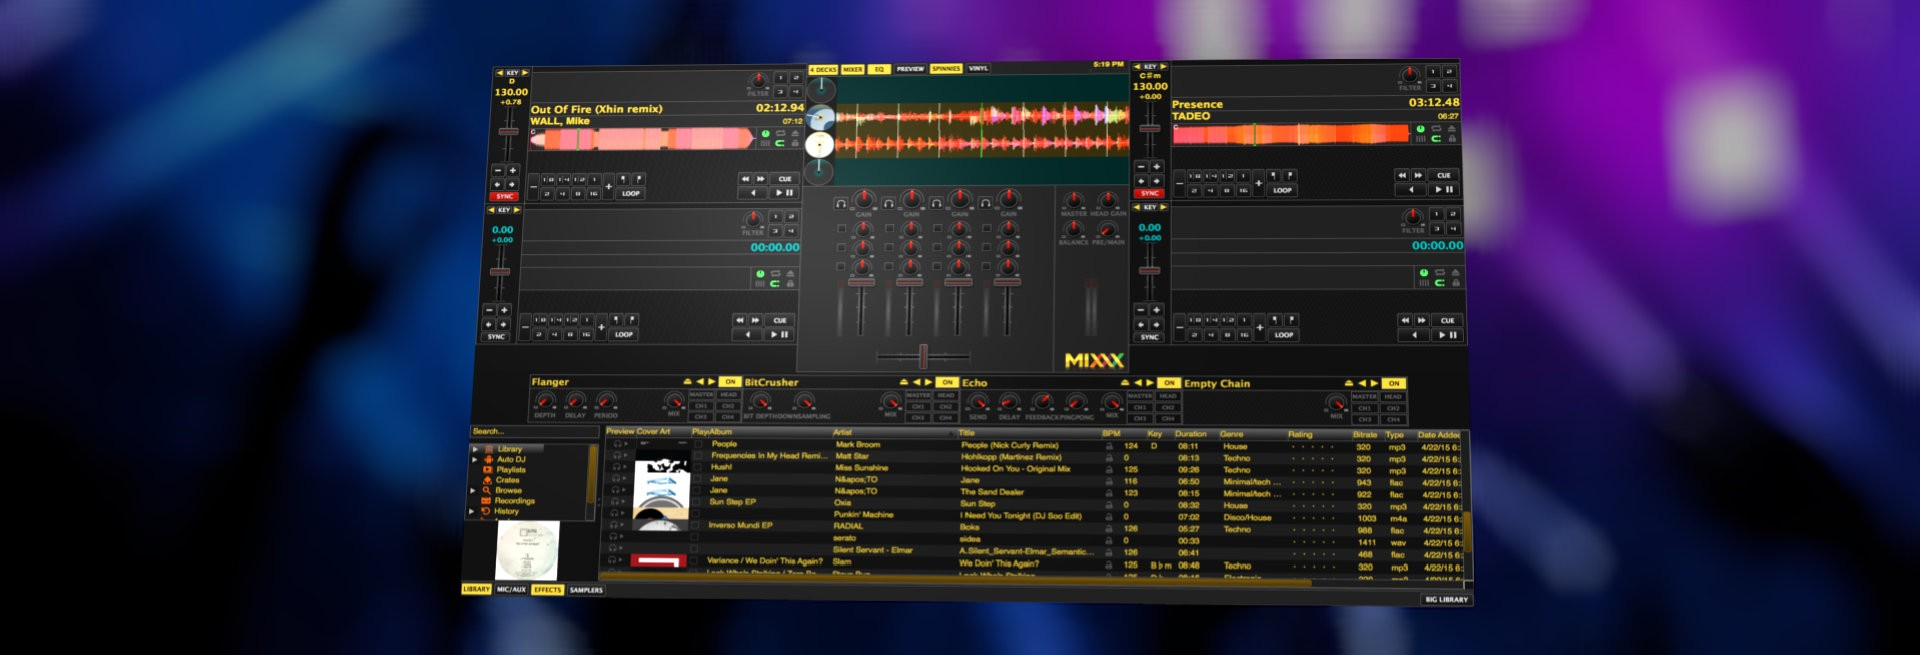 Mixxx 2 0 Open Source DJ Software Brings Better Support for